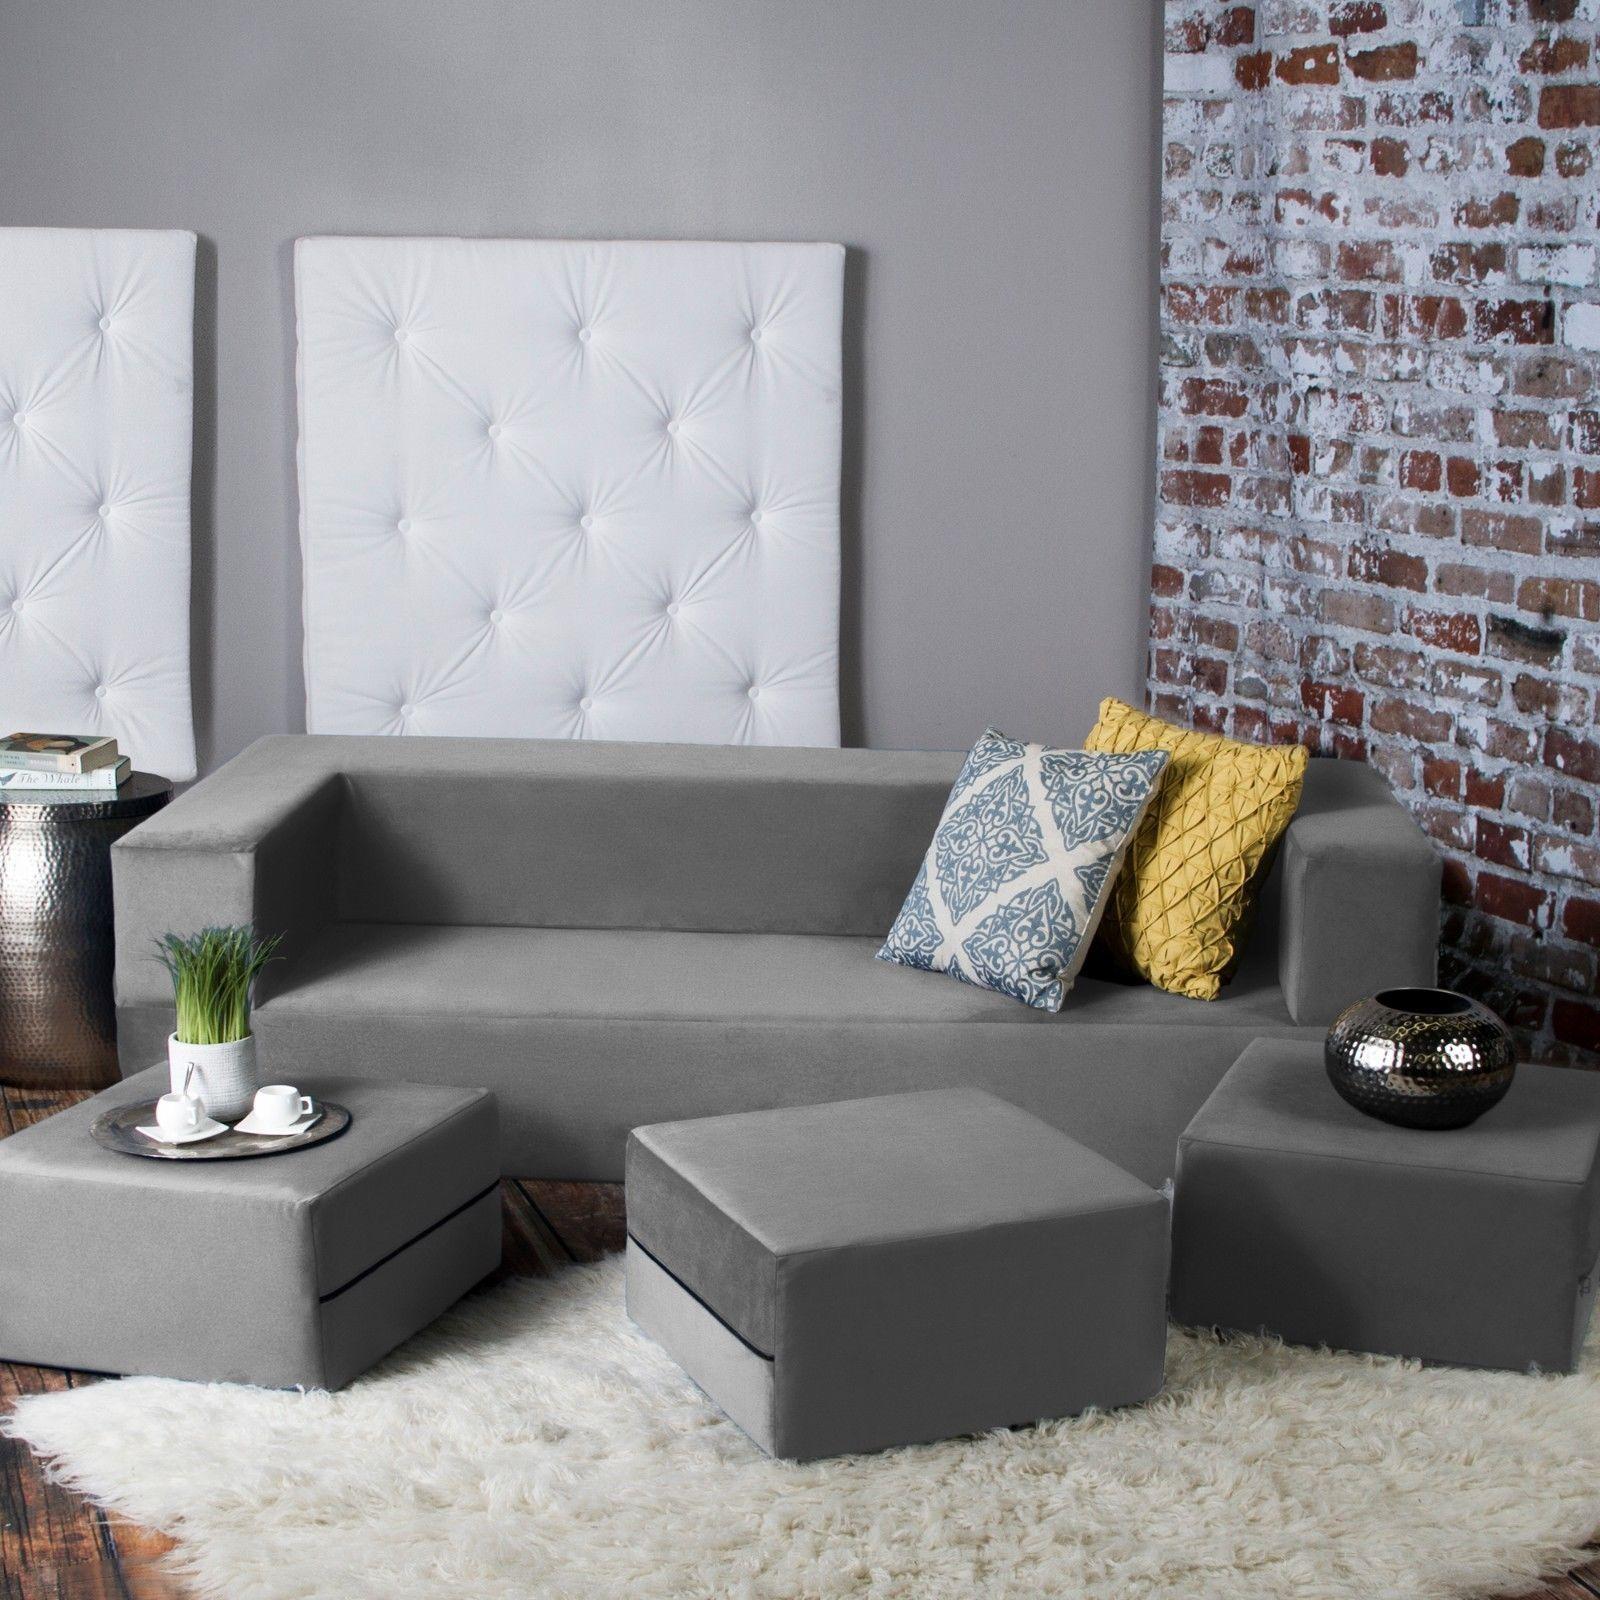 zipline convertible sleeper sofa ottomans and 50 similar items. Black Bedroom Furniture Sets. Home Design Ideas